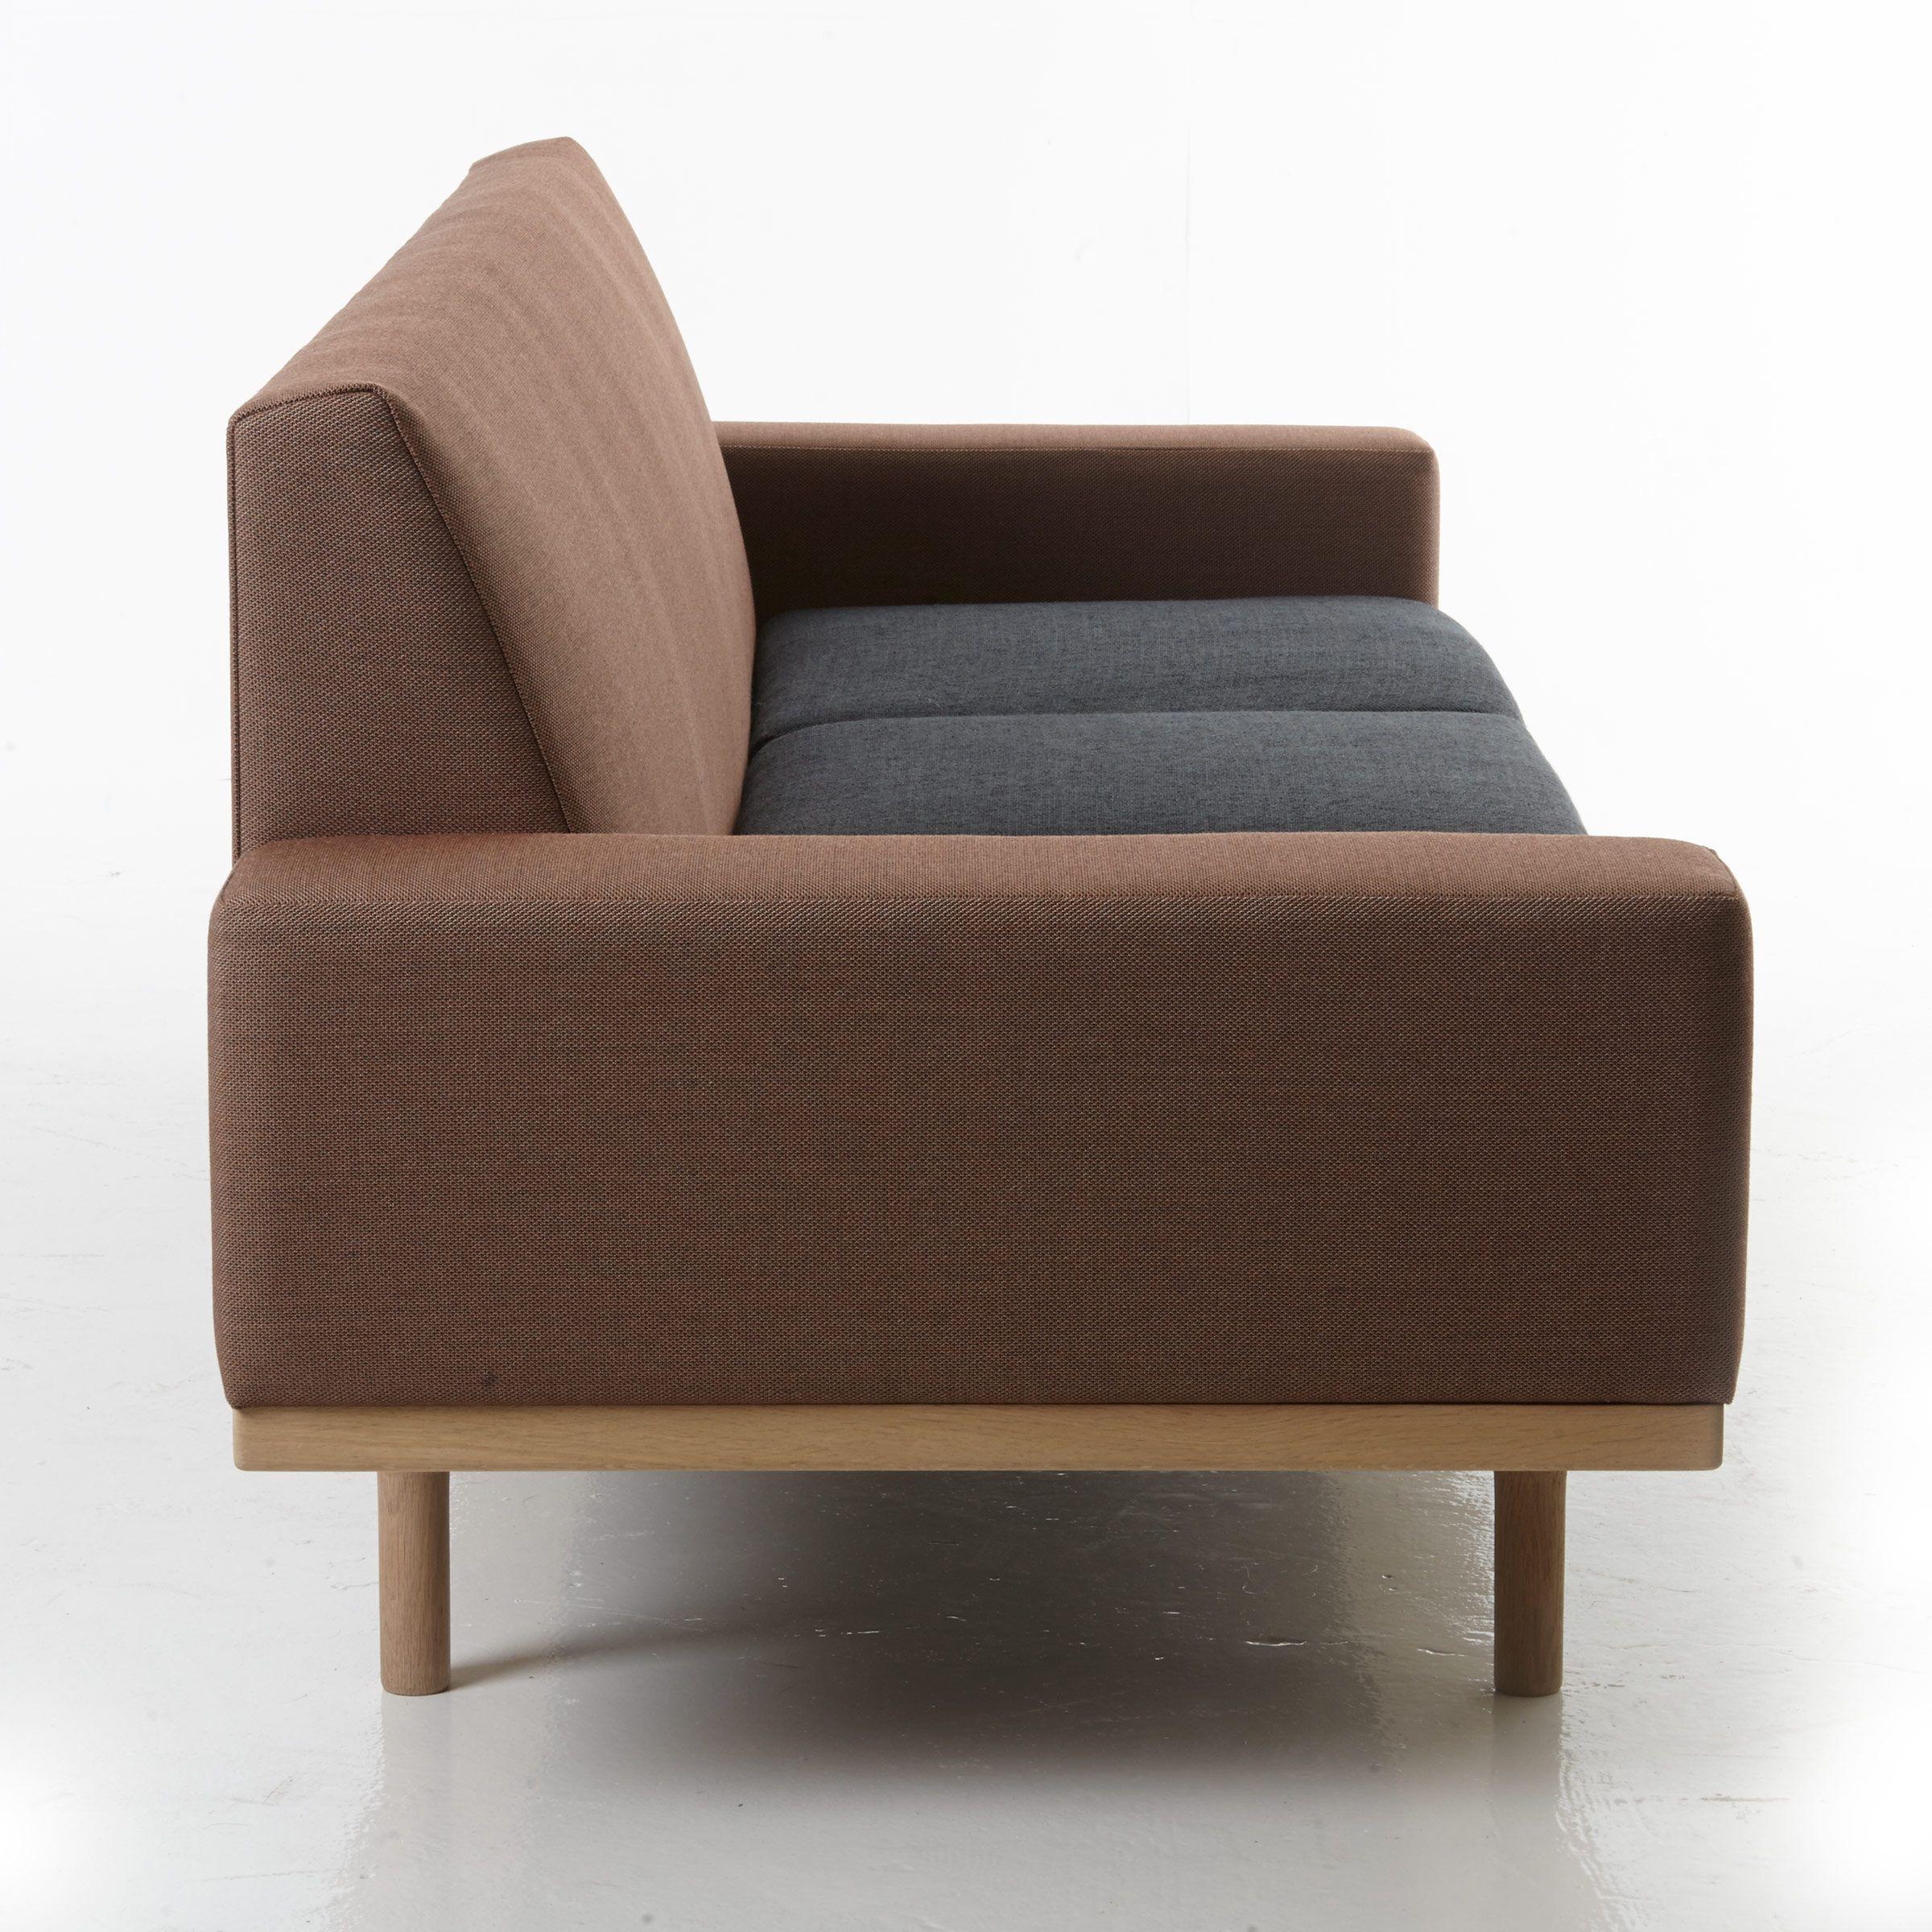 Danish Style Sofa Australia Clean Leather Saddle Soap Illum Wikkelso Three Seater Exclusive To